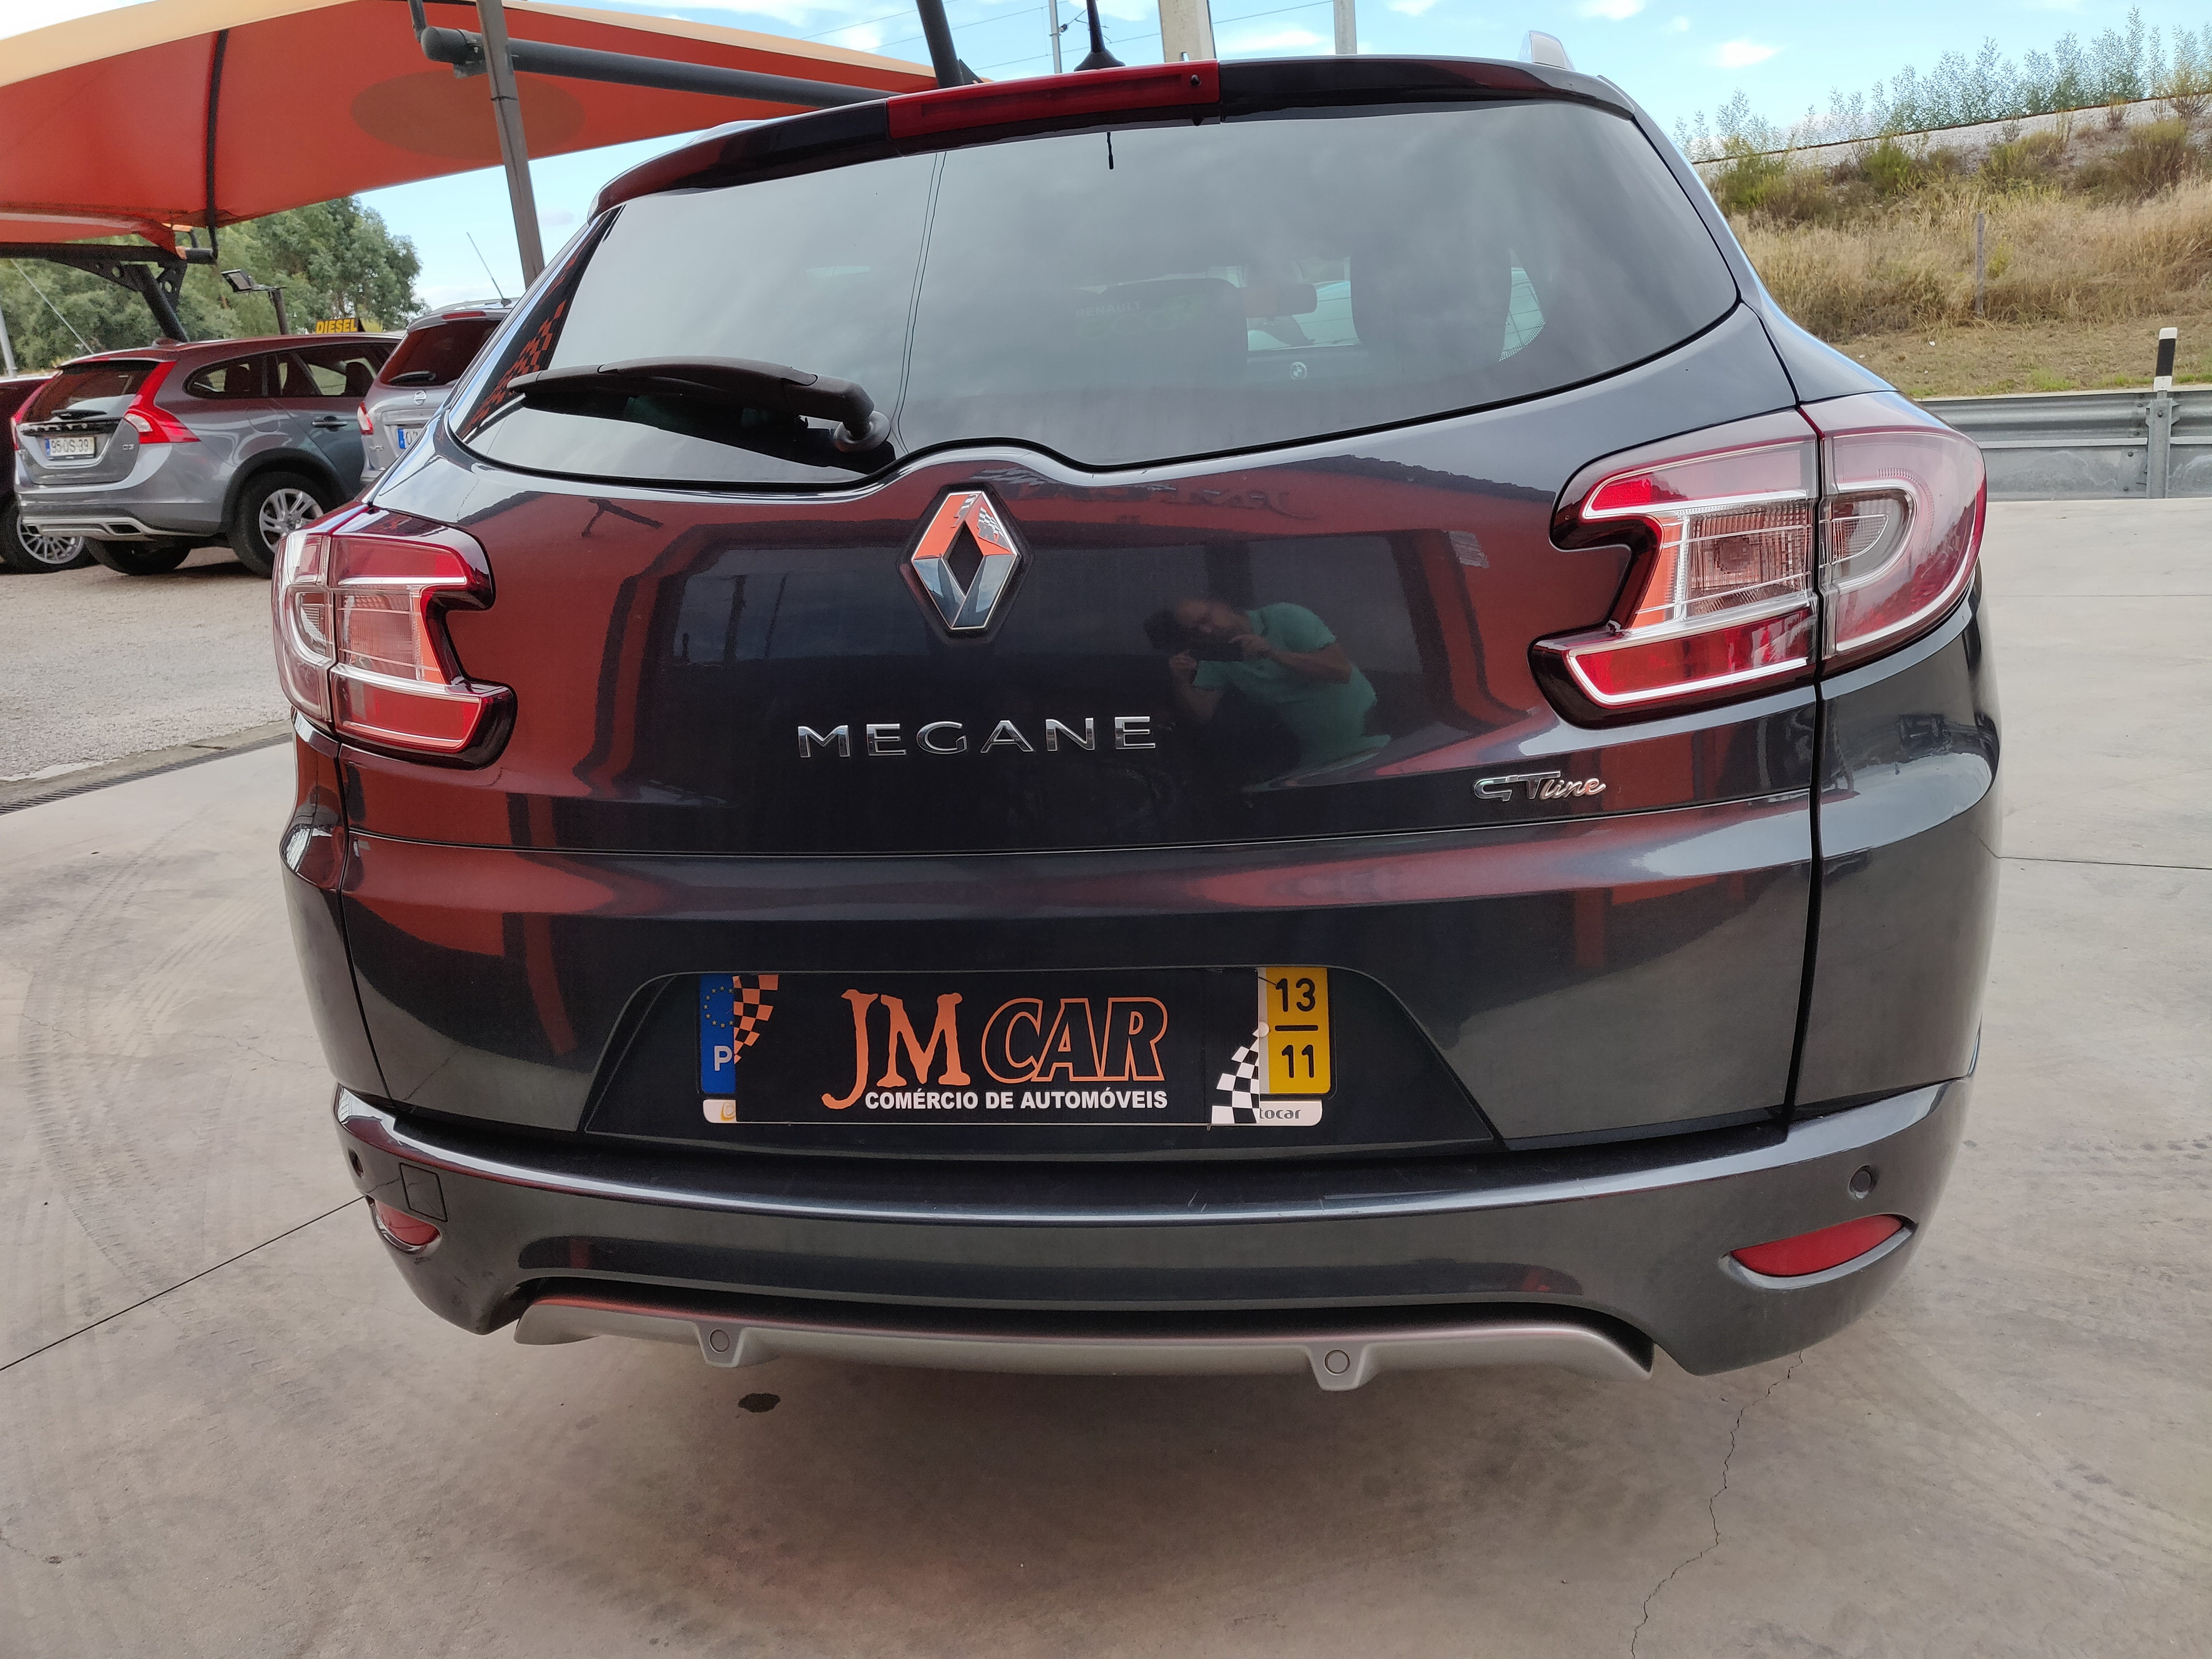 Renault Megane Break 1 5dci Gt Line Full Extras Jmcar